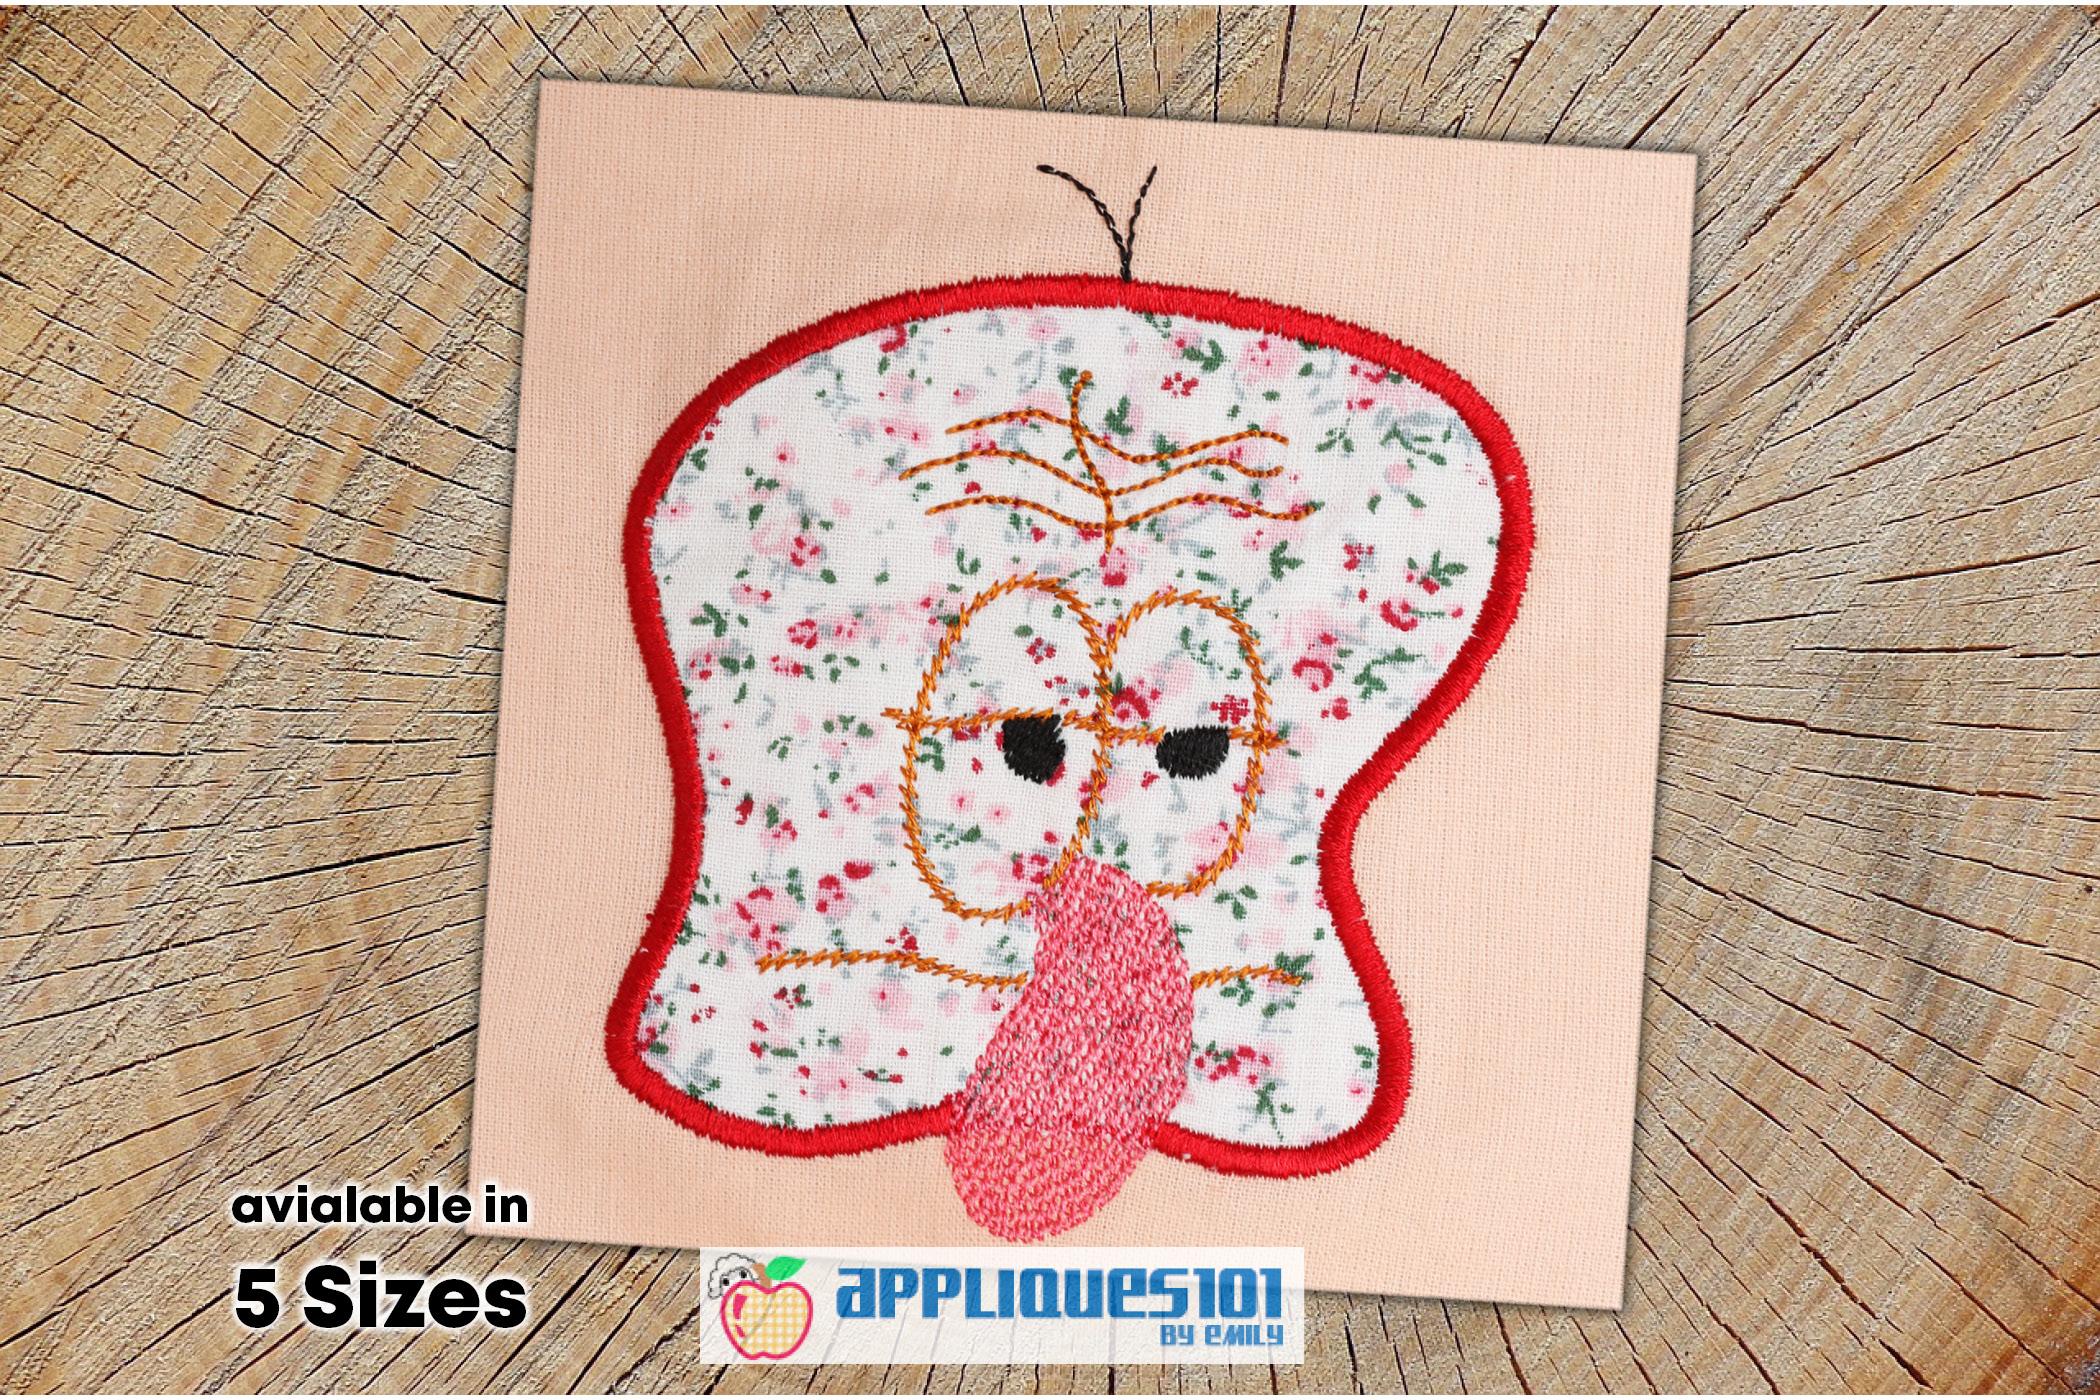 Funny Sad Face Machine Embroidery Applique Design - Faces example image 1